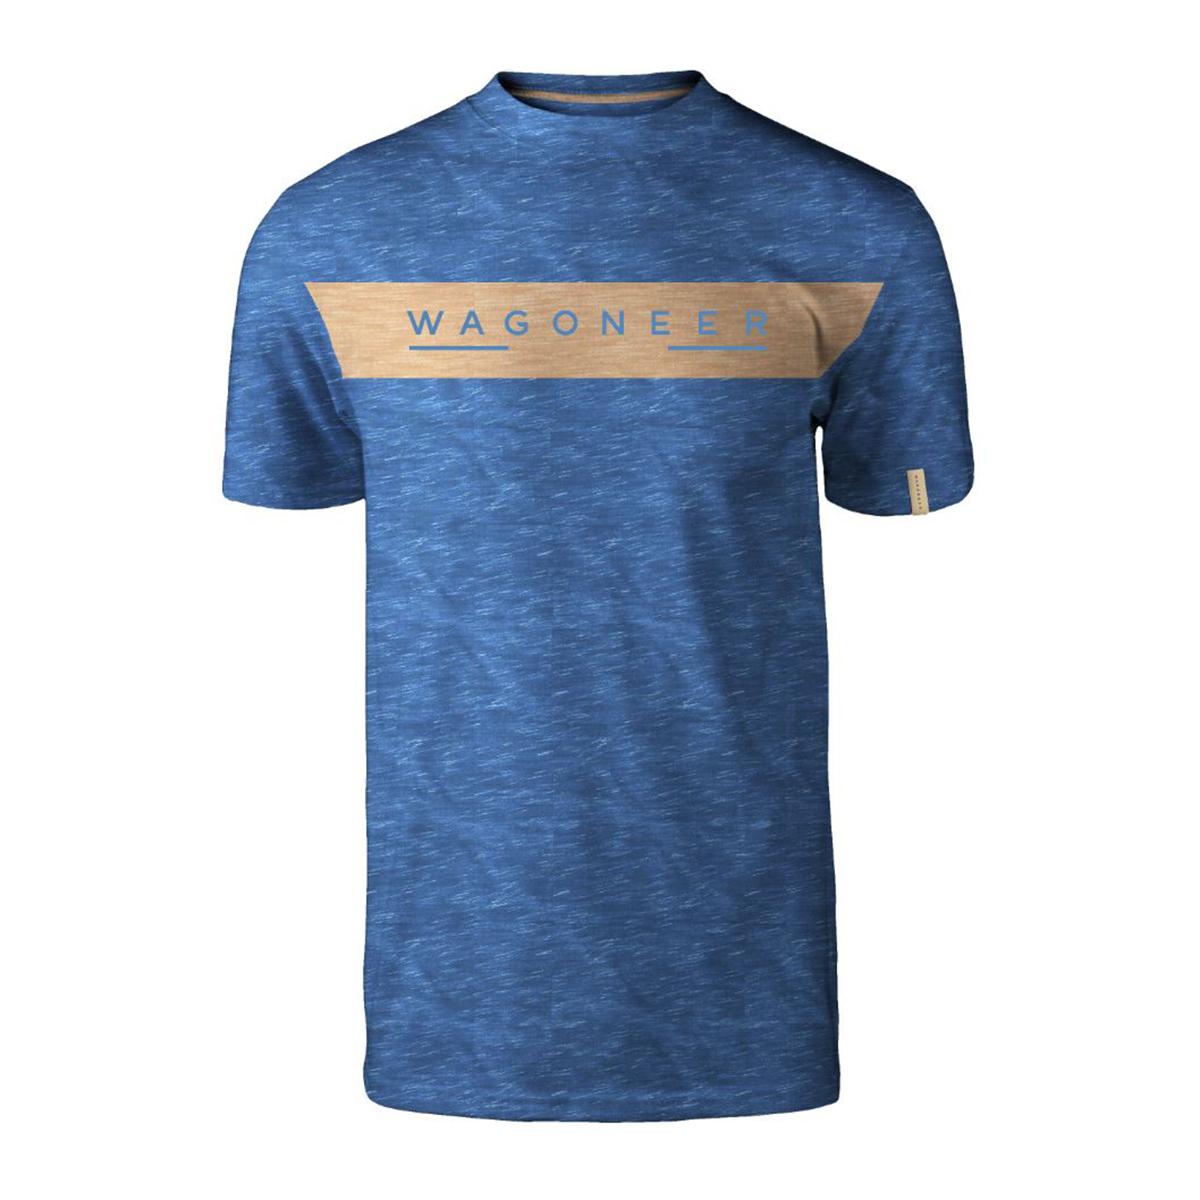 Men's Wagoneer T-Shirt